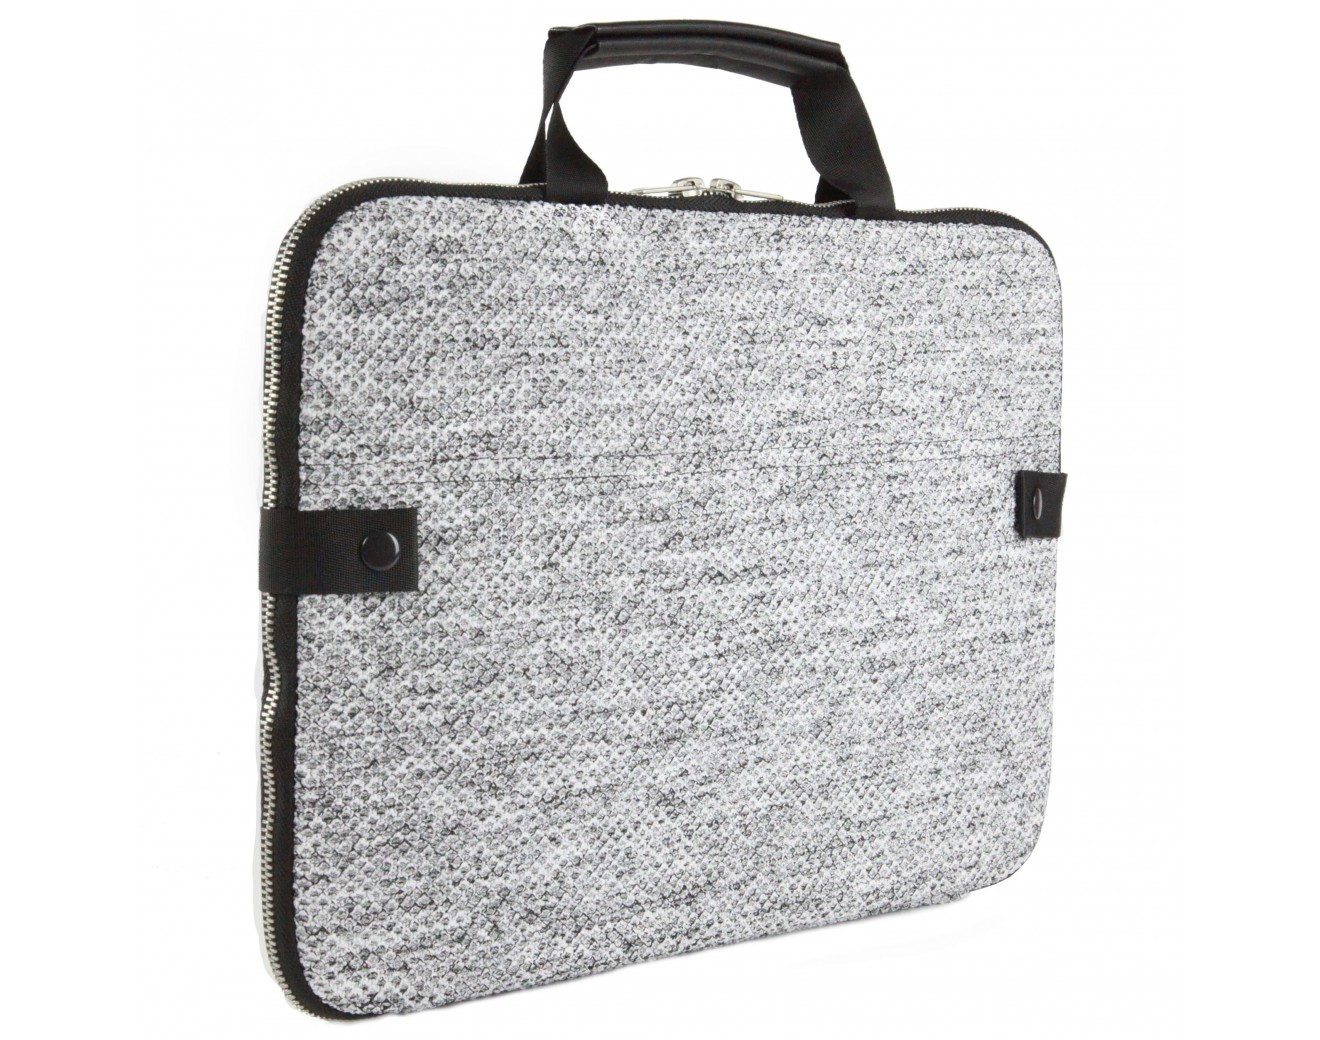 Чанта Speck Station Sleeve Pro 13-14 inch Laptop - Speckled